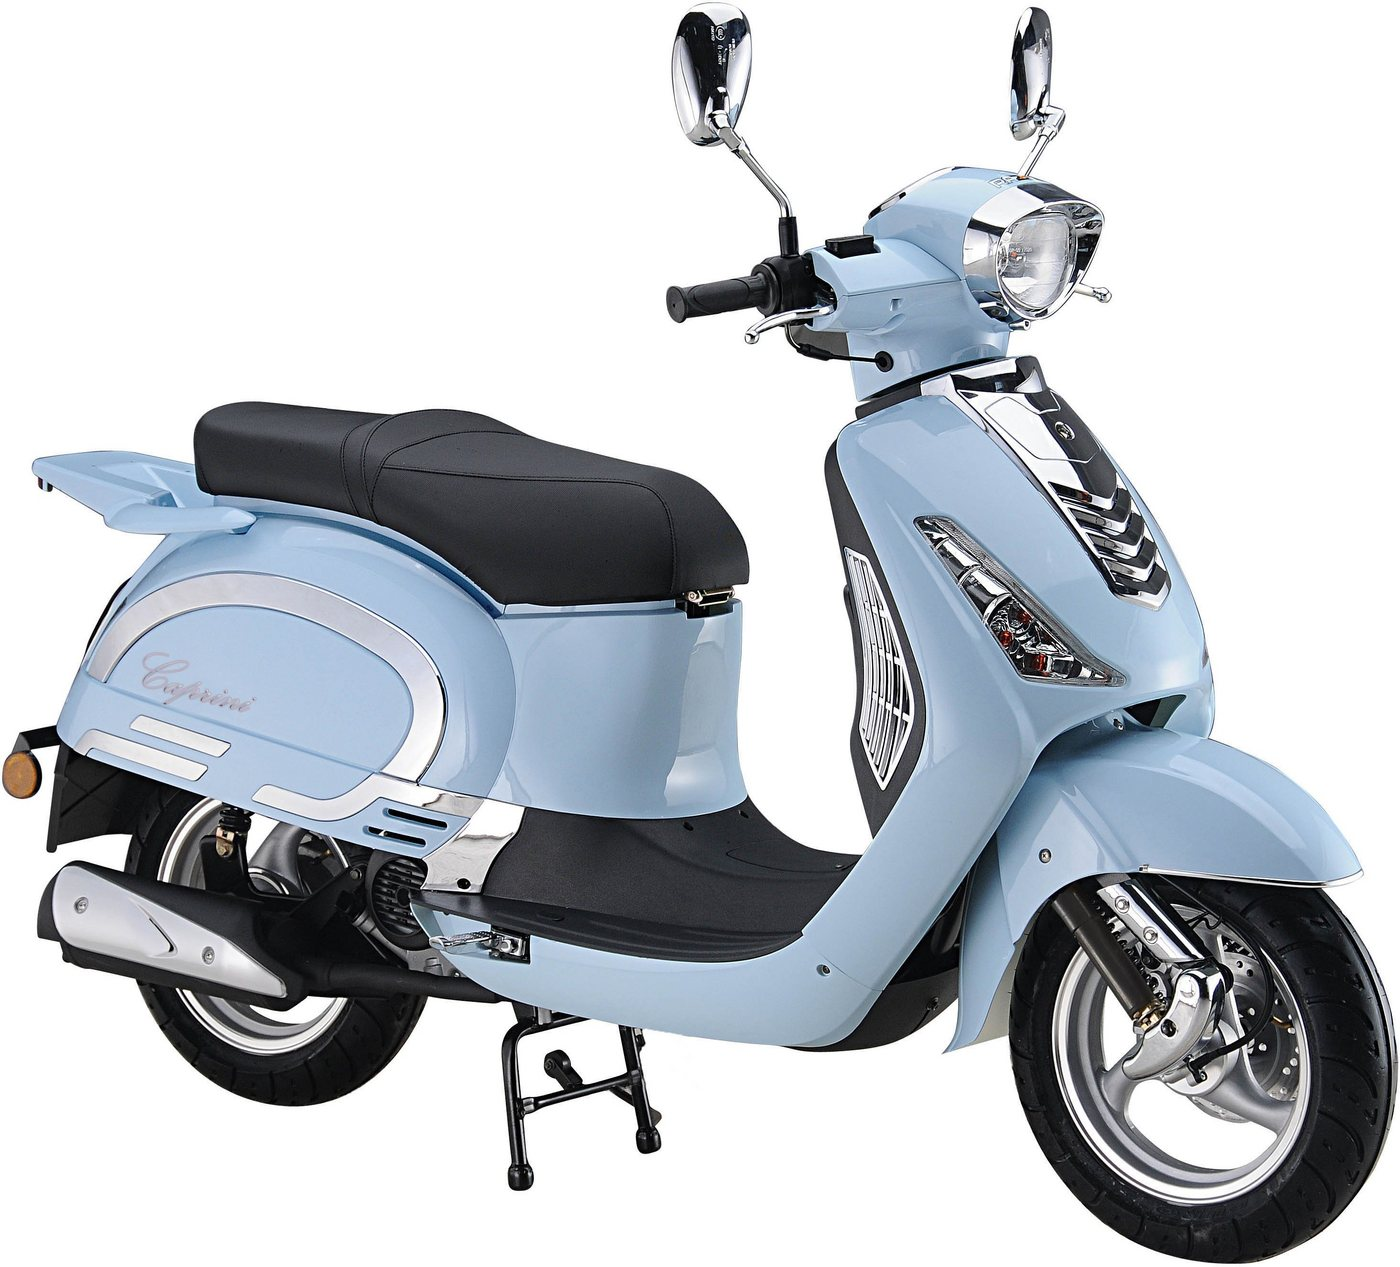 Rondelli Mofaroller, 50 ccm, 25 km/h, »Flower« - Preisvergleich